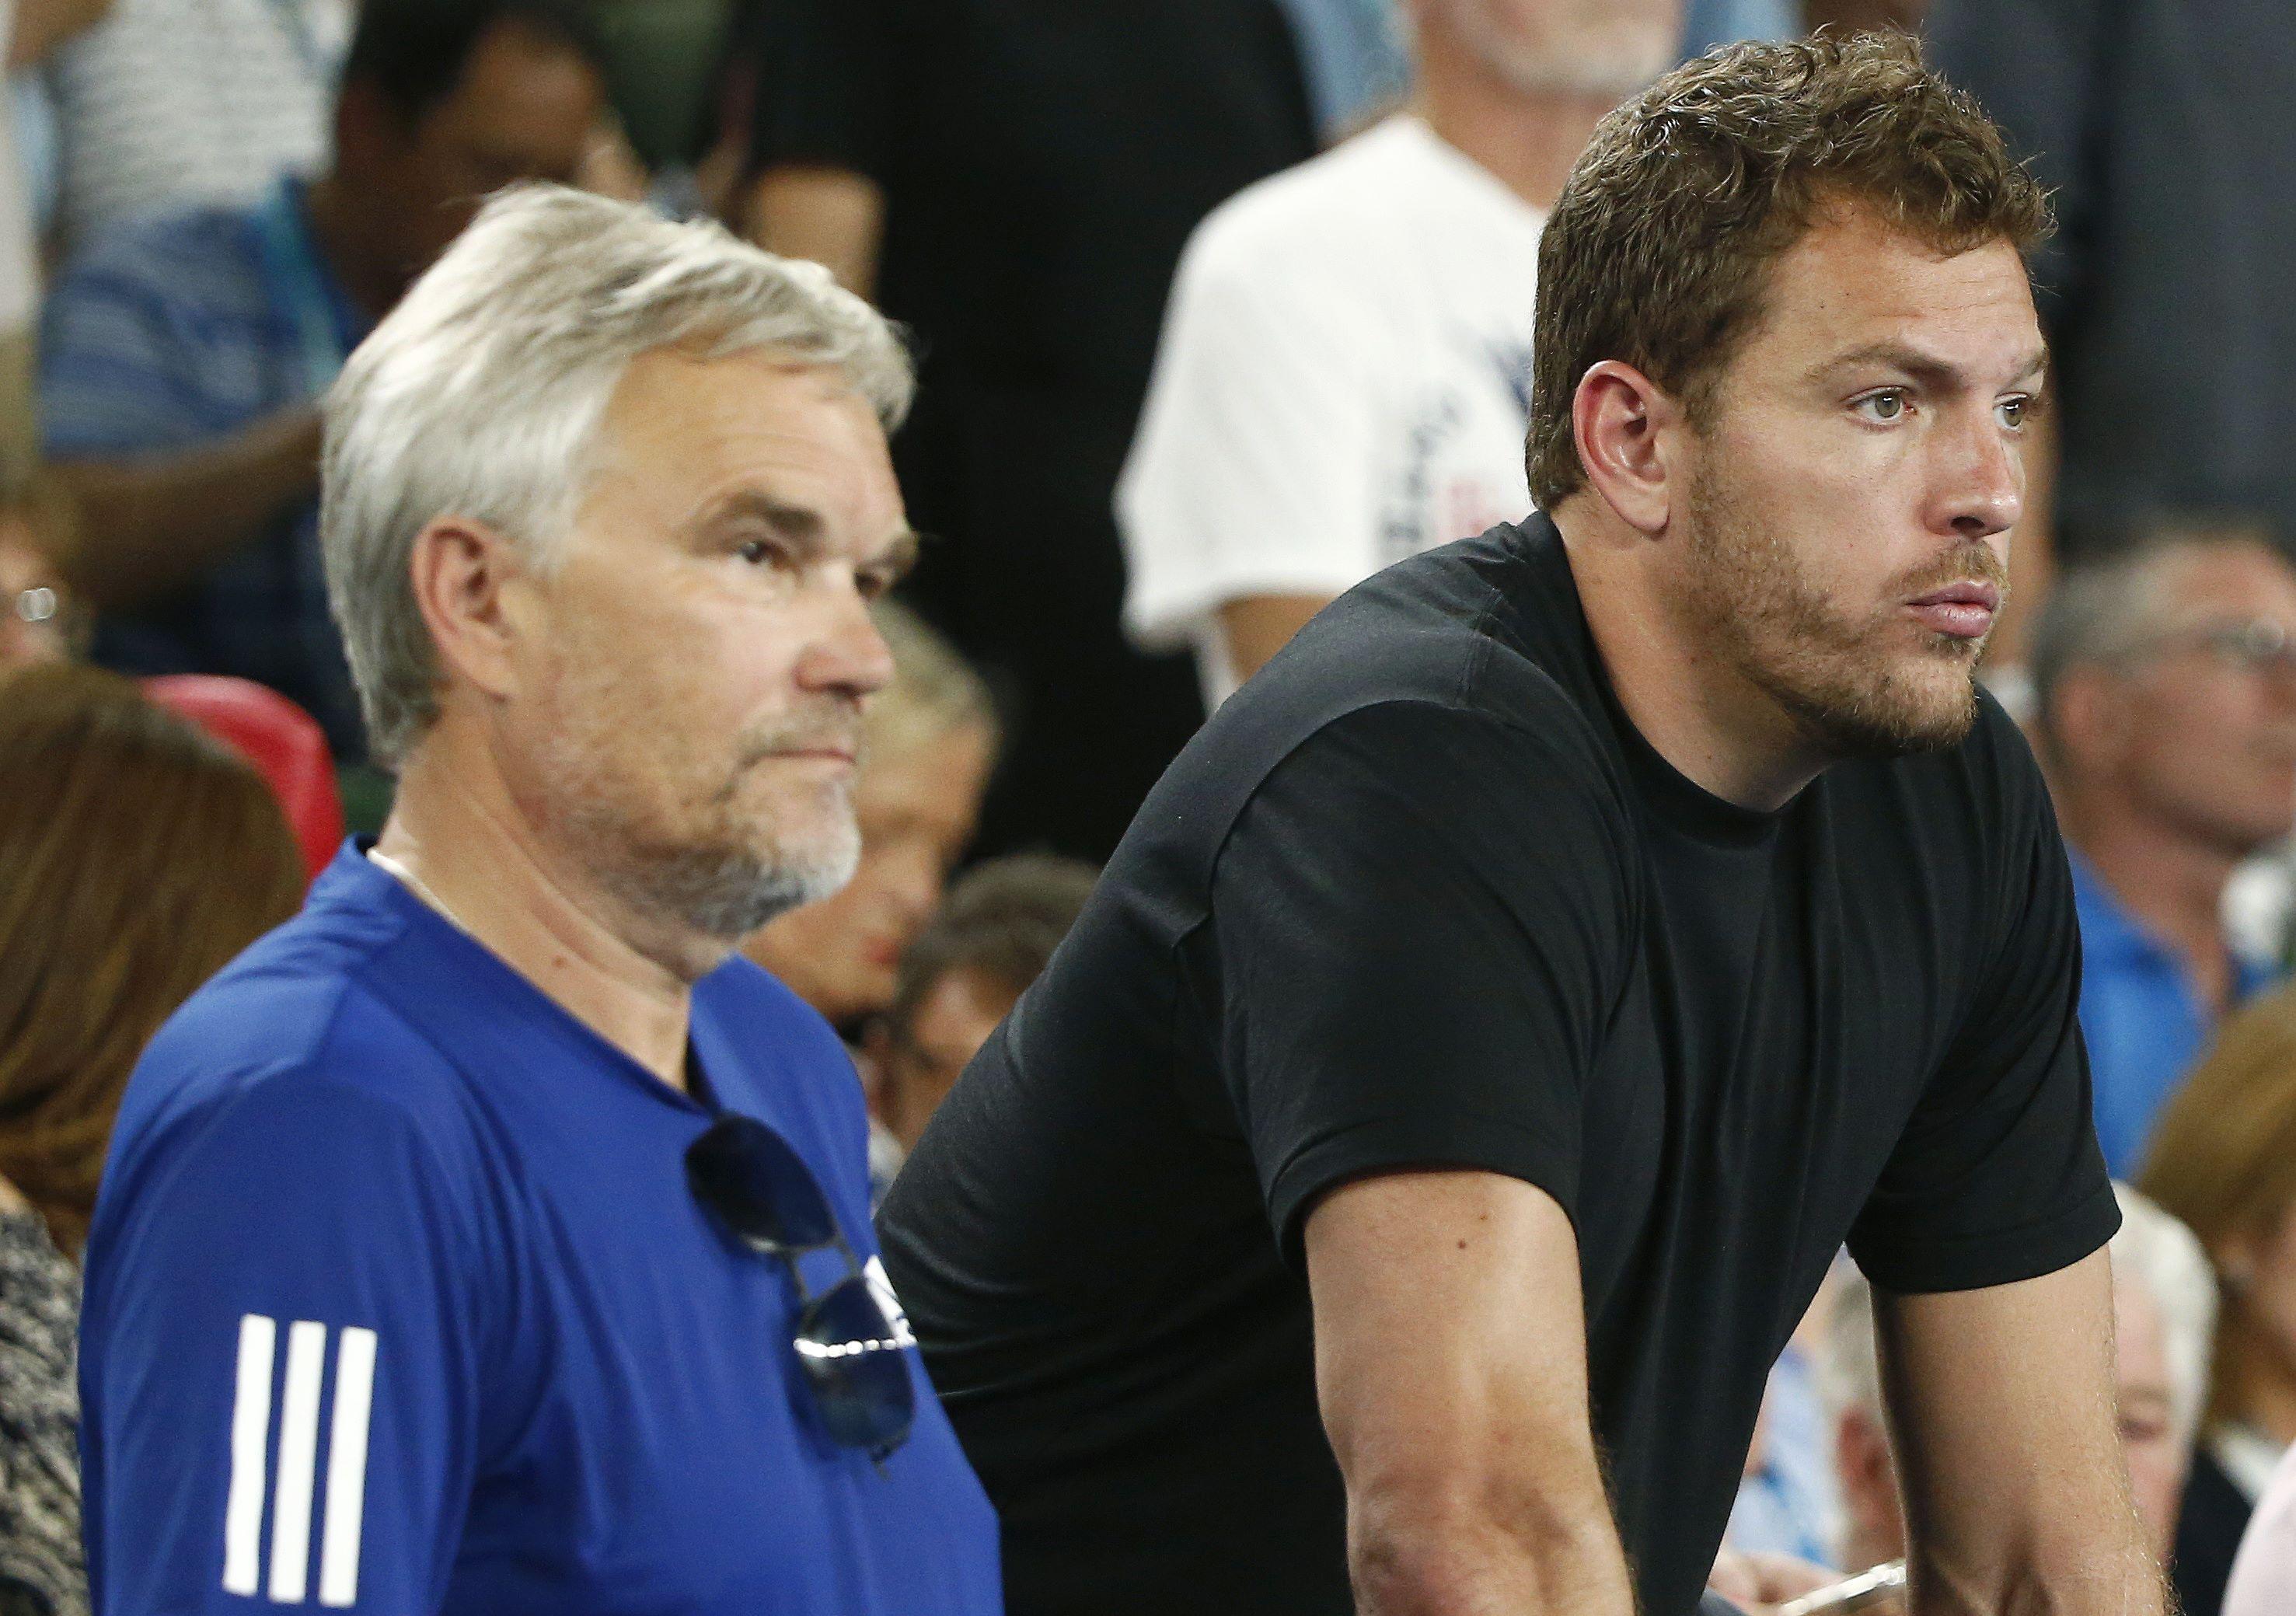 Piotr Wozniacki and the Dane's fiance David Lee watch on in Melbourne